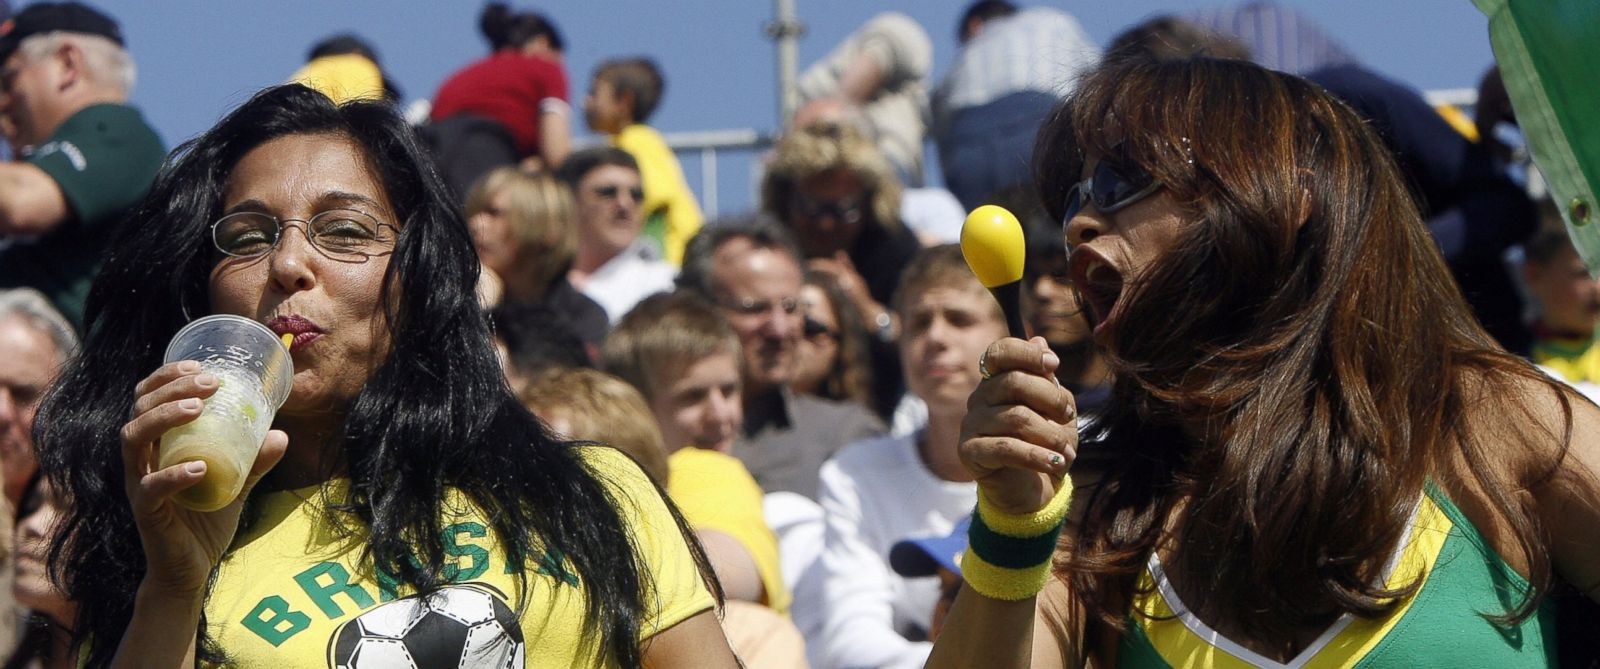 PHOTO: A Brazilian football fan enjoys a Caipirinha